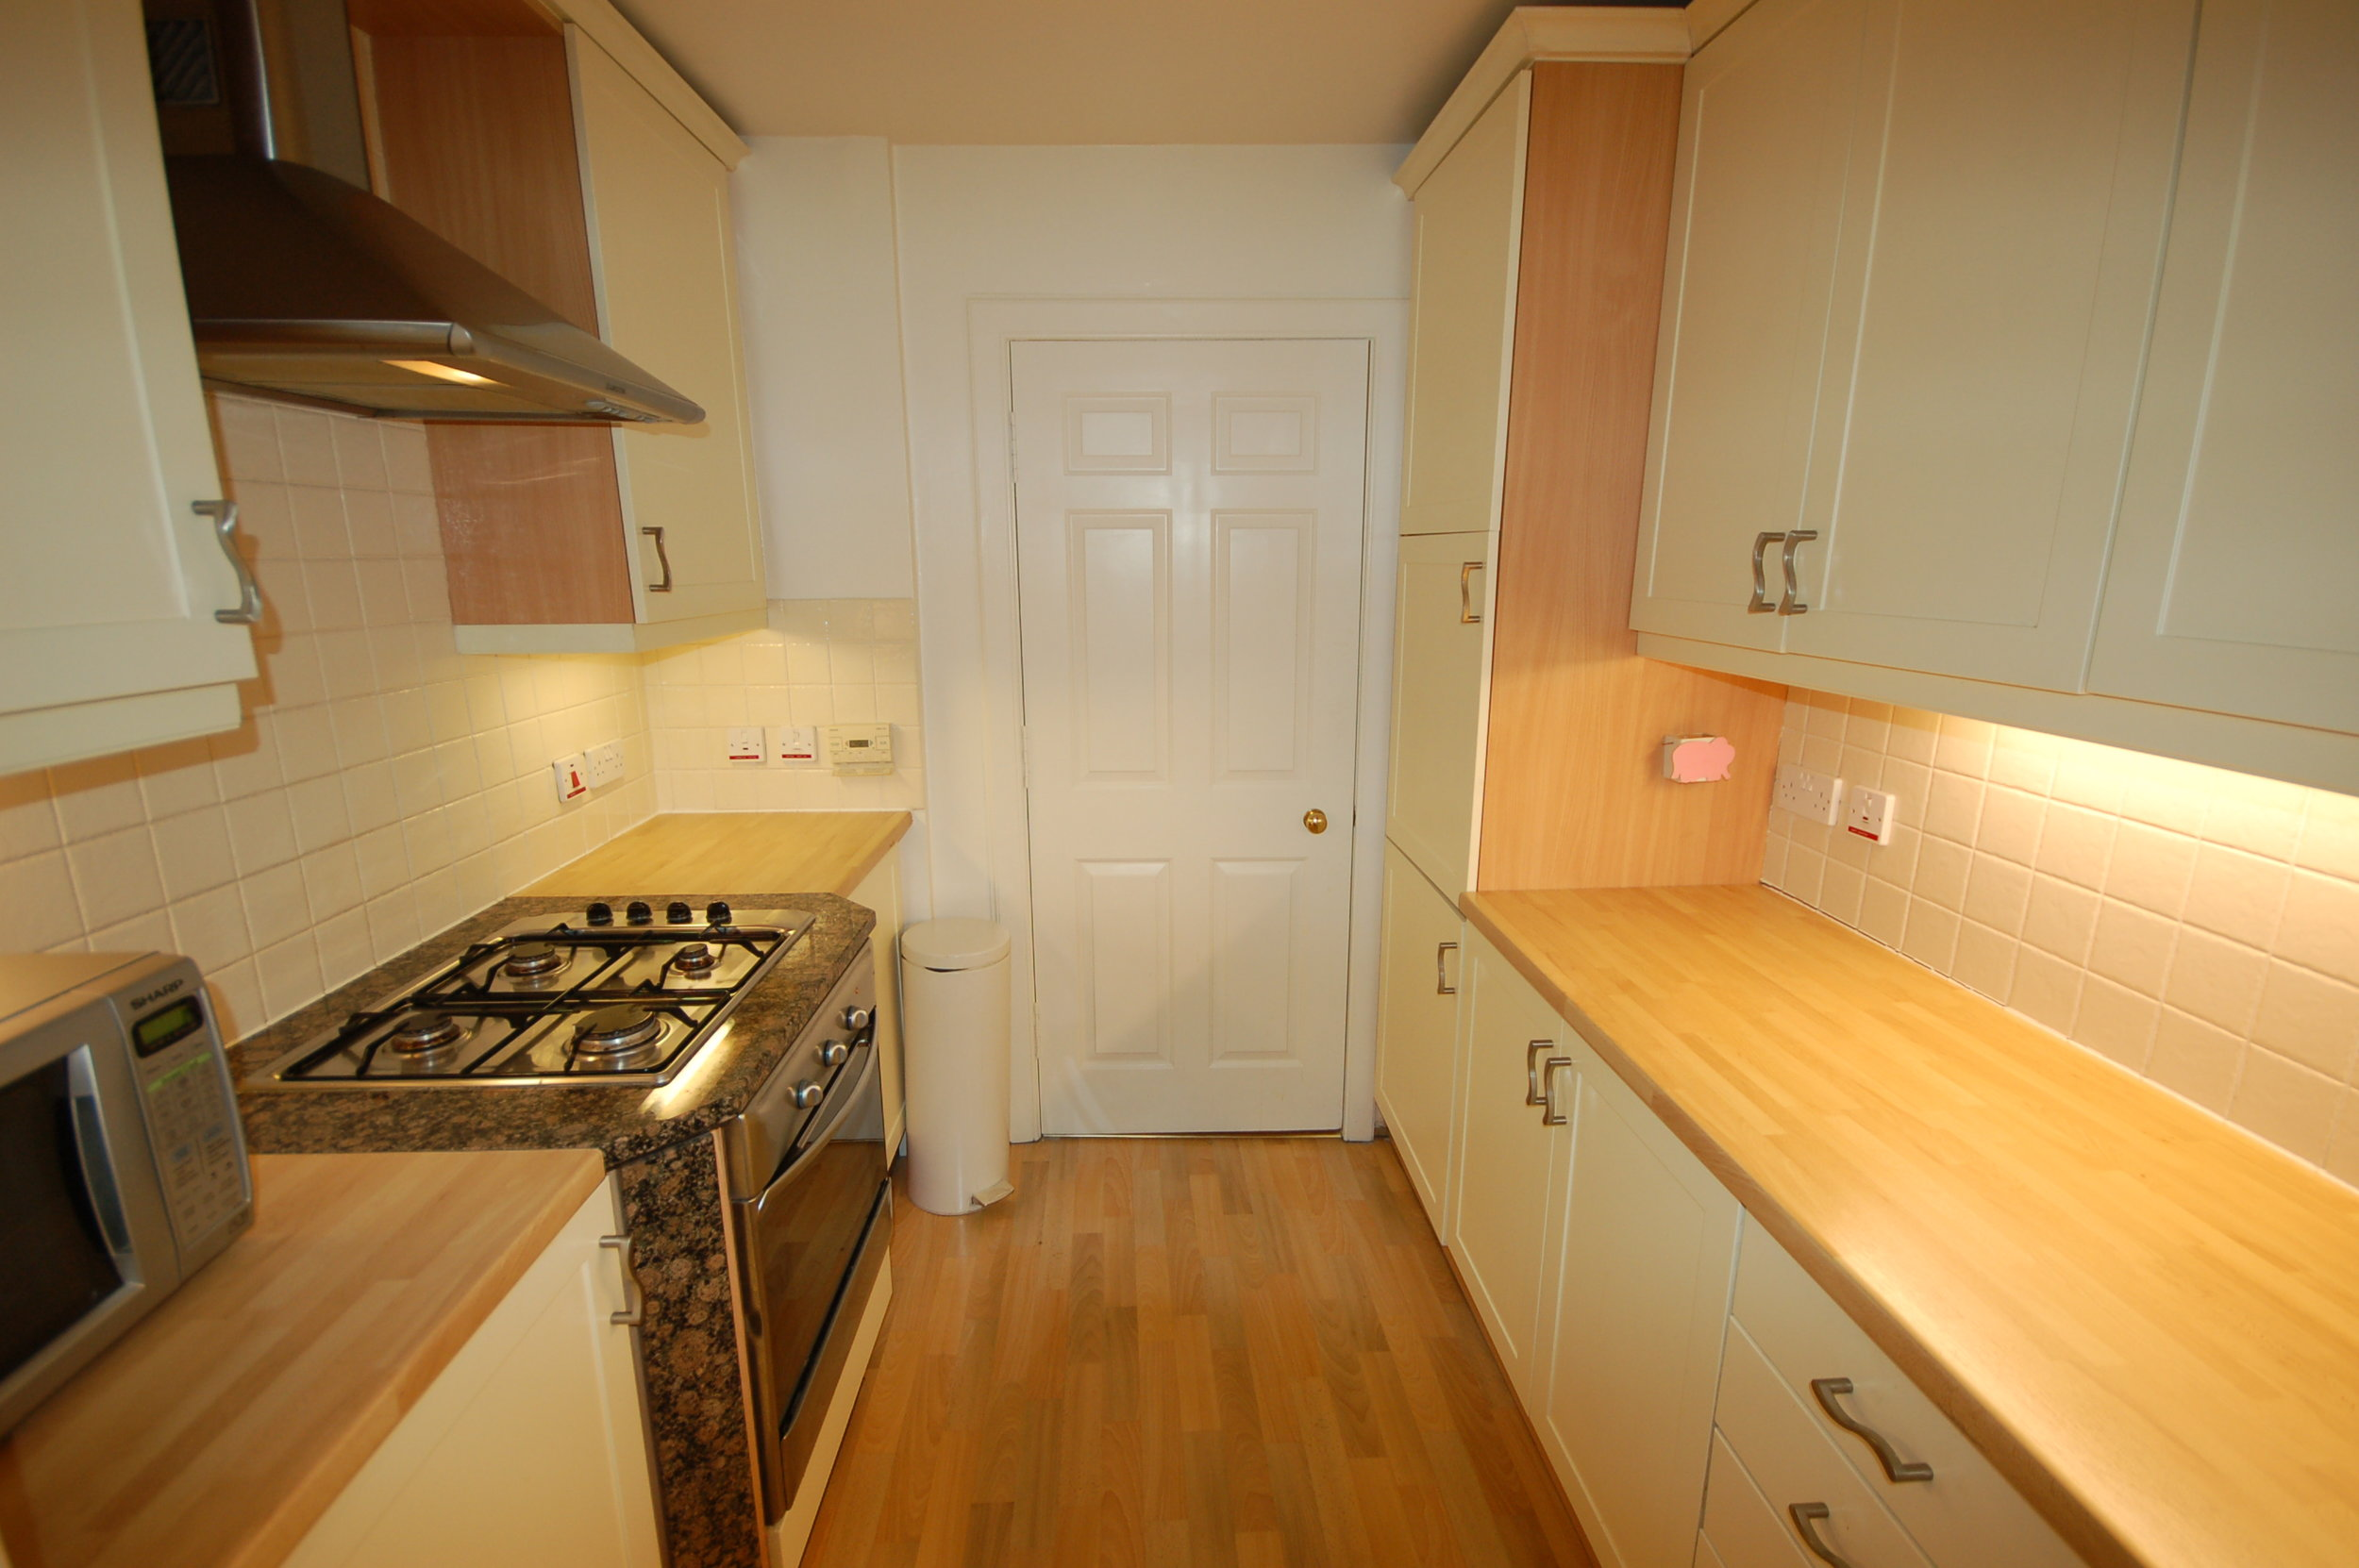 kitchen2_6151074384_o.jpg